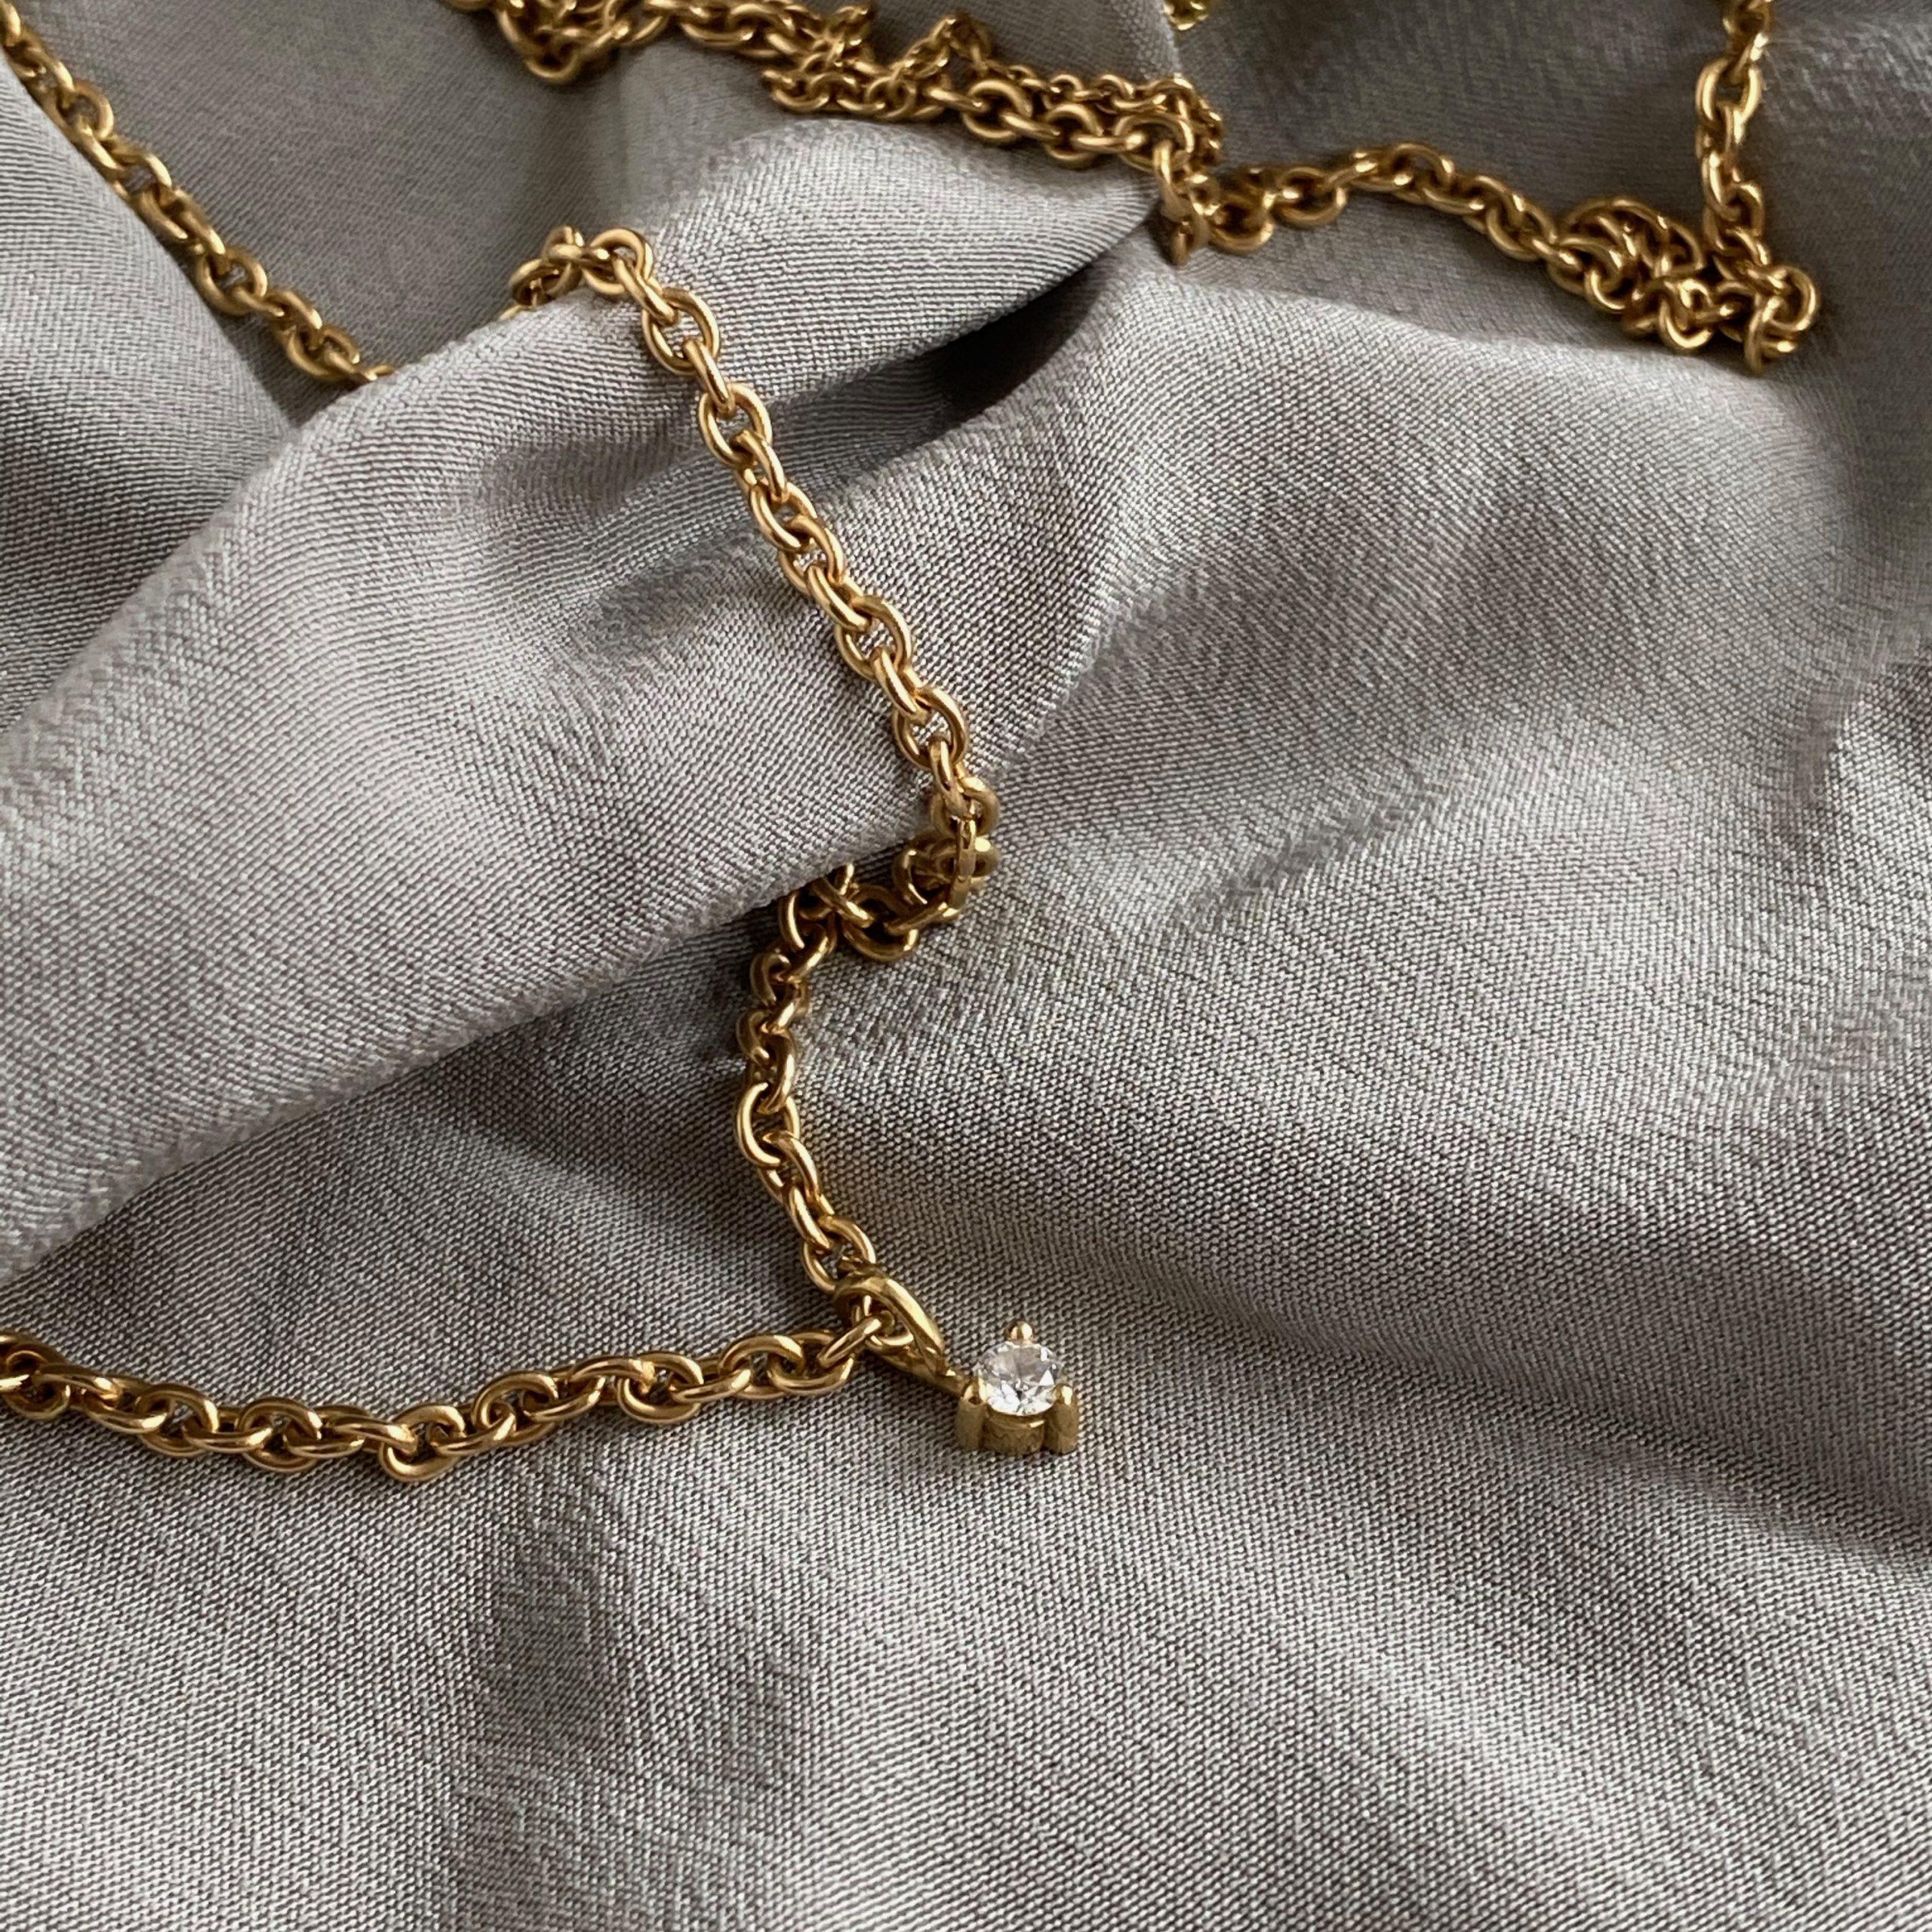 Diamond Pendant on a Long Gold Chain